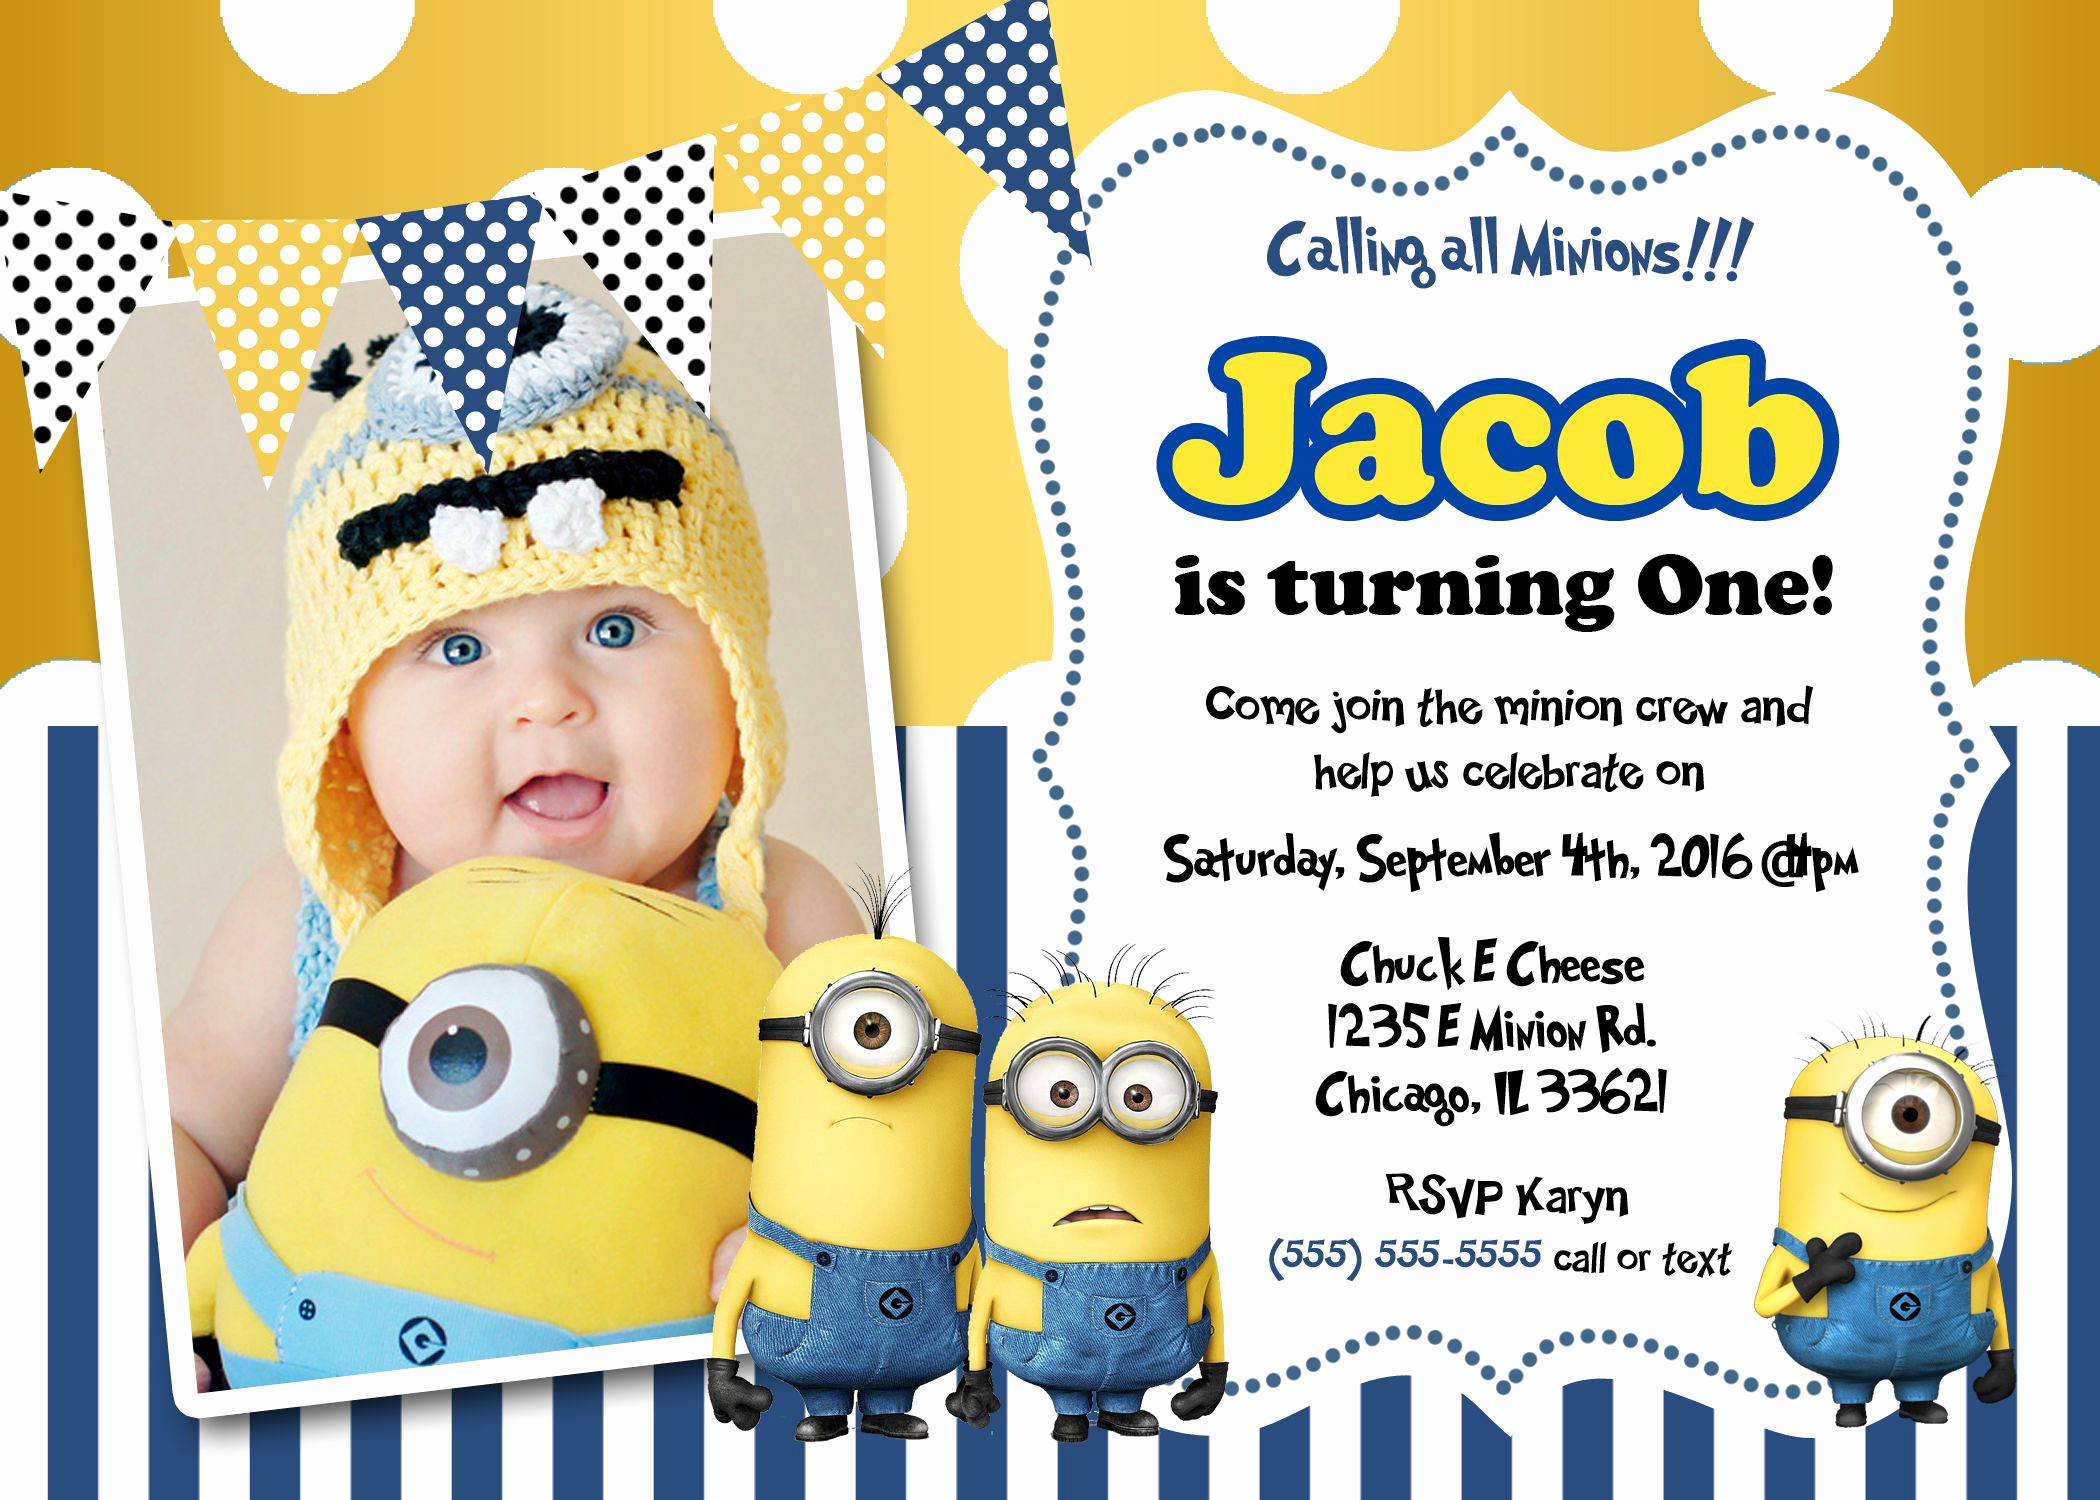 Minions Birthday Invitation Card Inspirational Create Own Minion Birthday Invitations Modern Templates